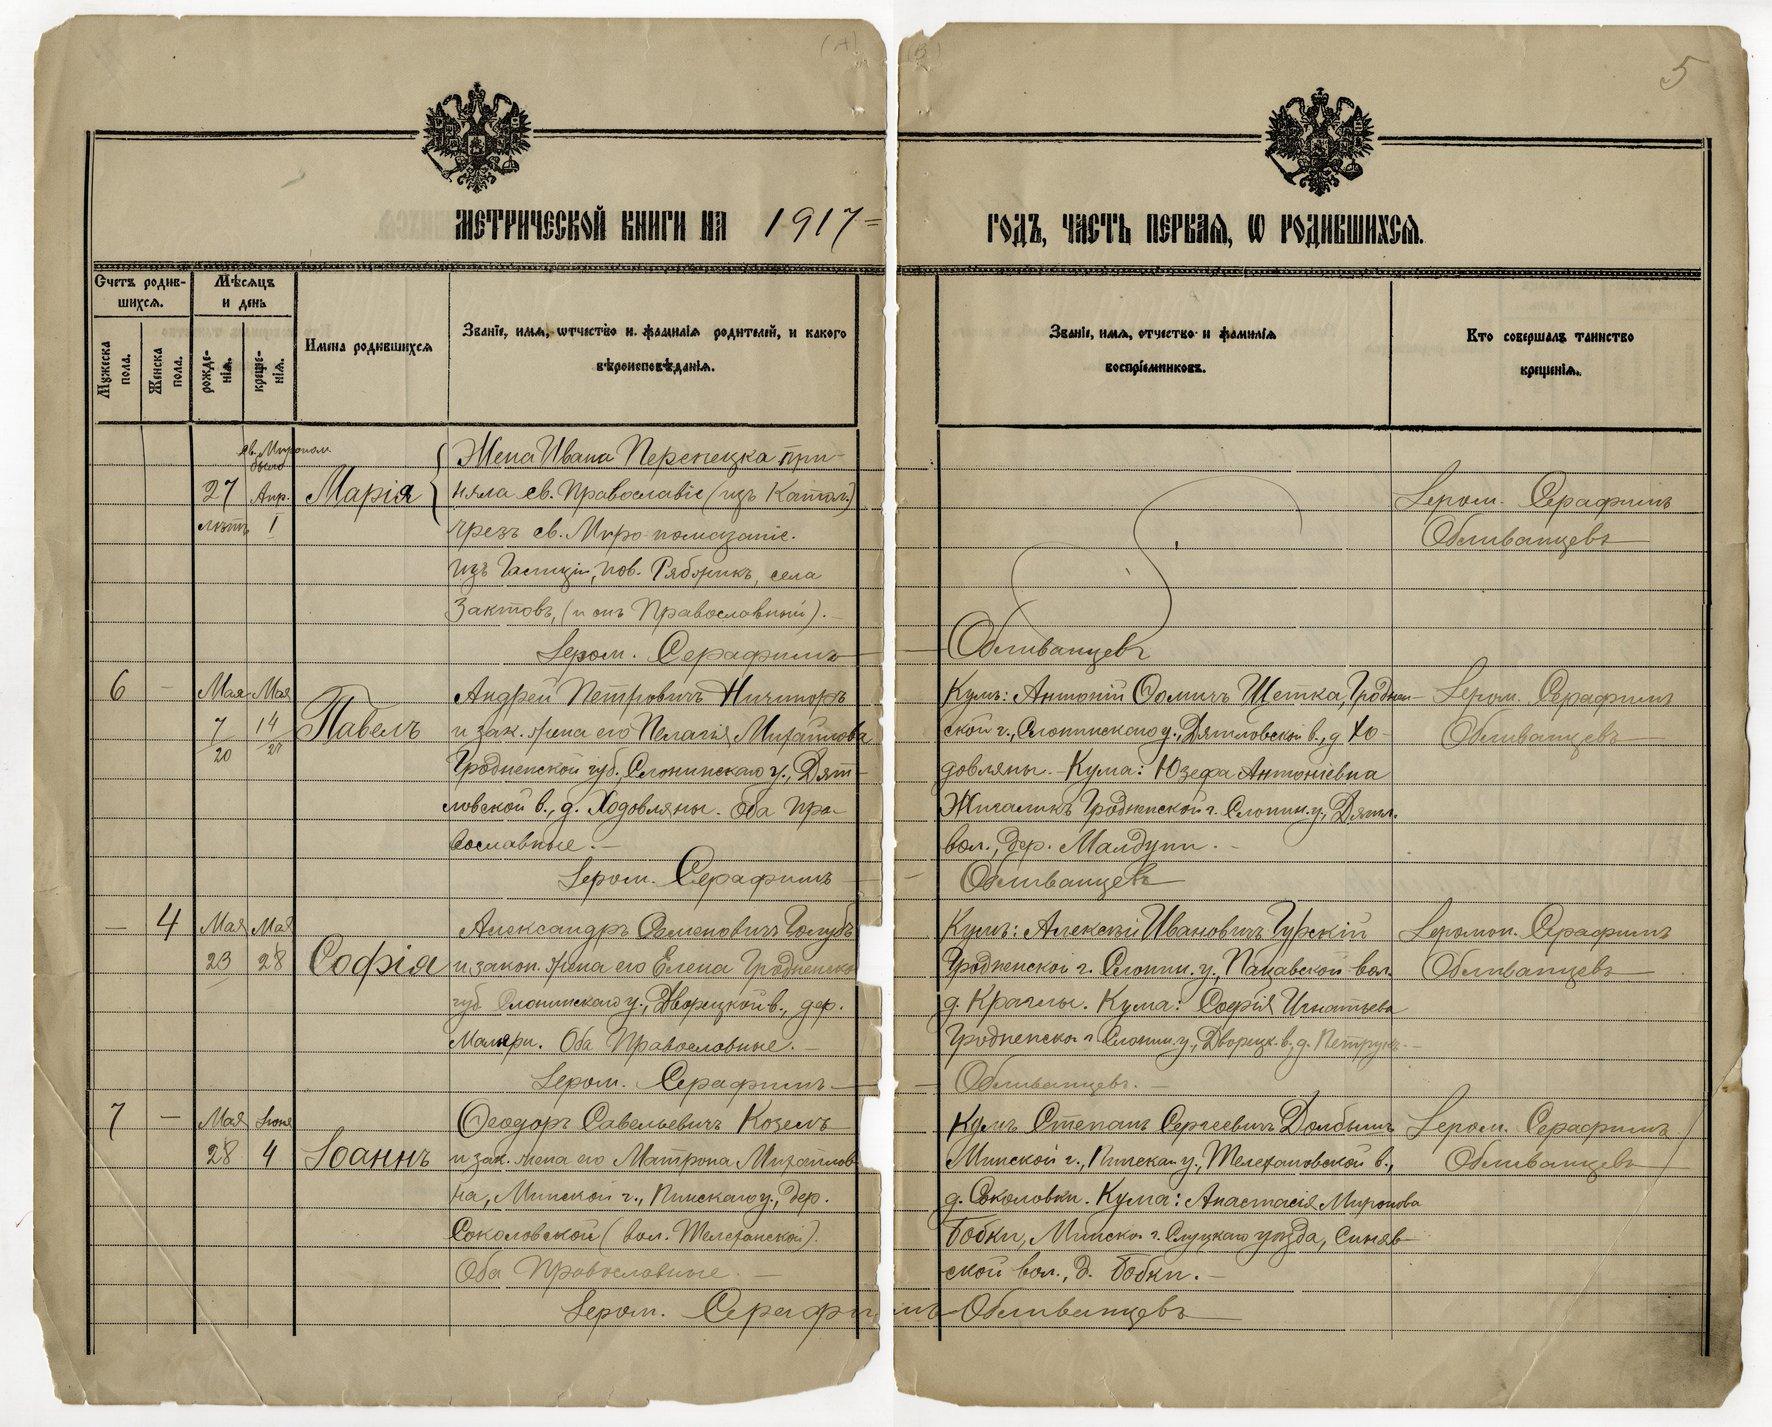 Birth, marriage and death register, Holy Trinity Russian Orthodox Church, Kansas City, Kansas - 1917 - 005 - Birth